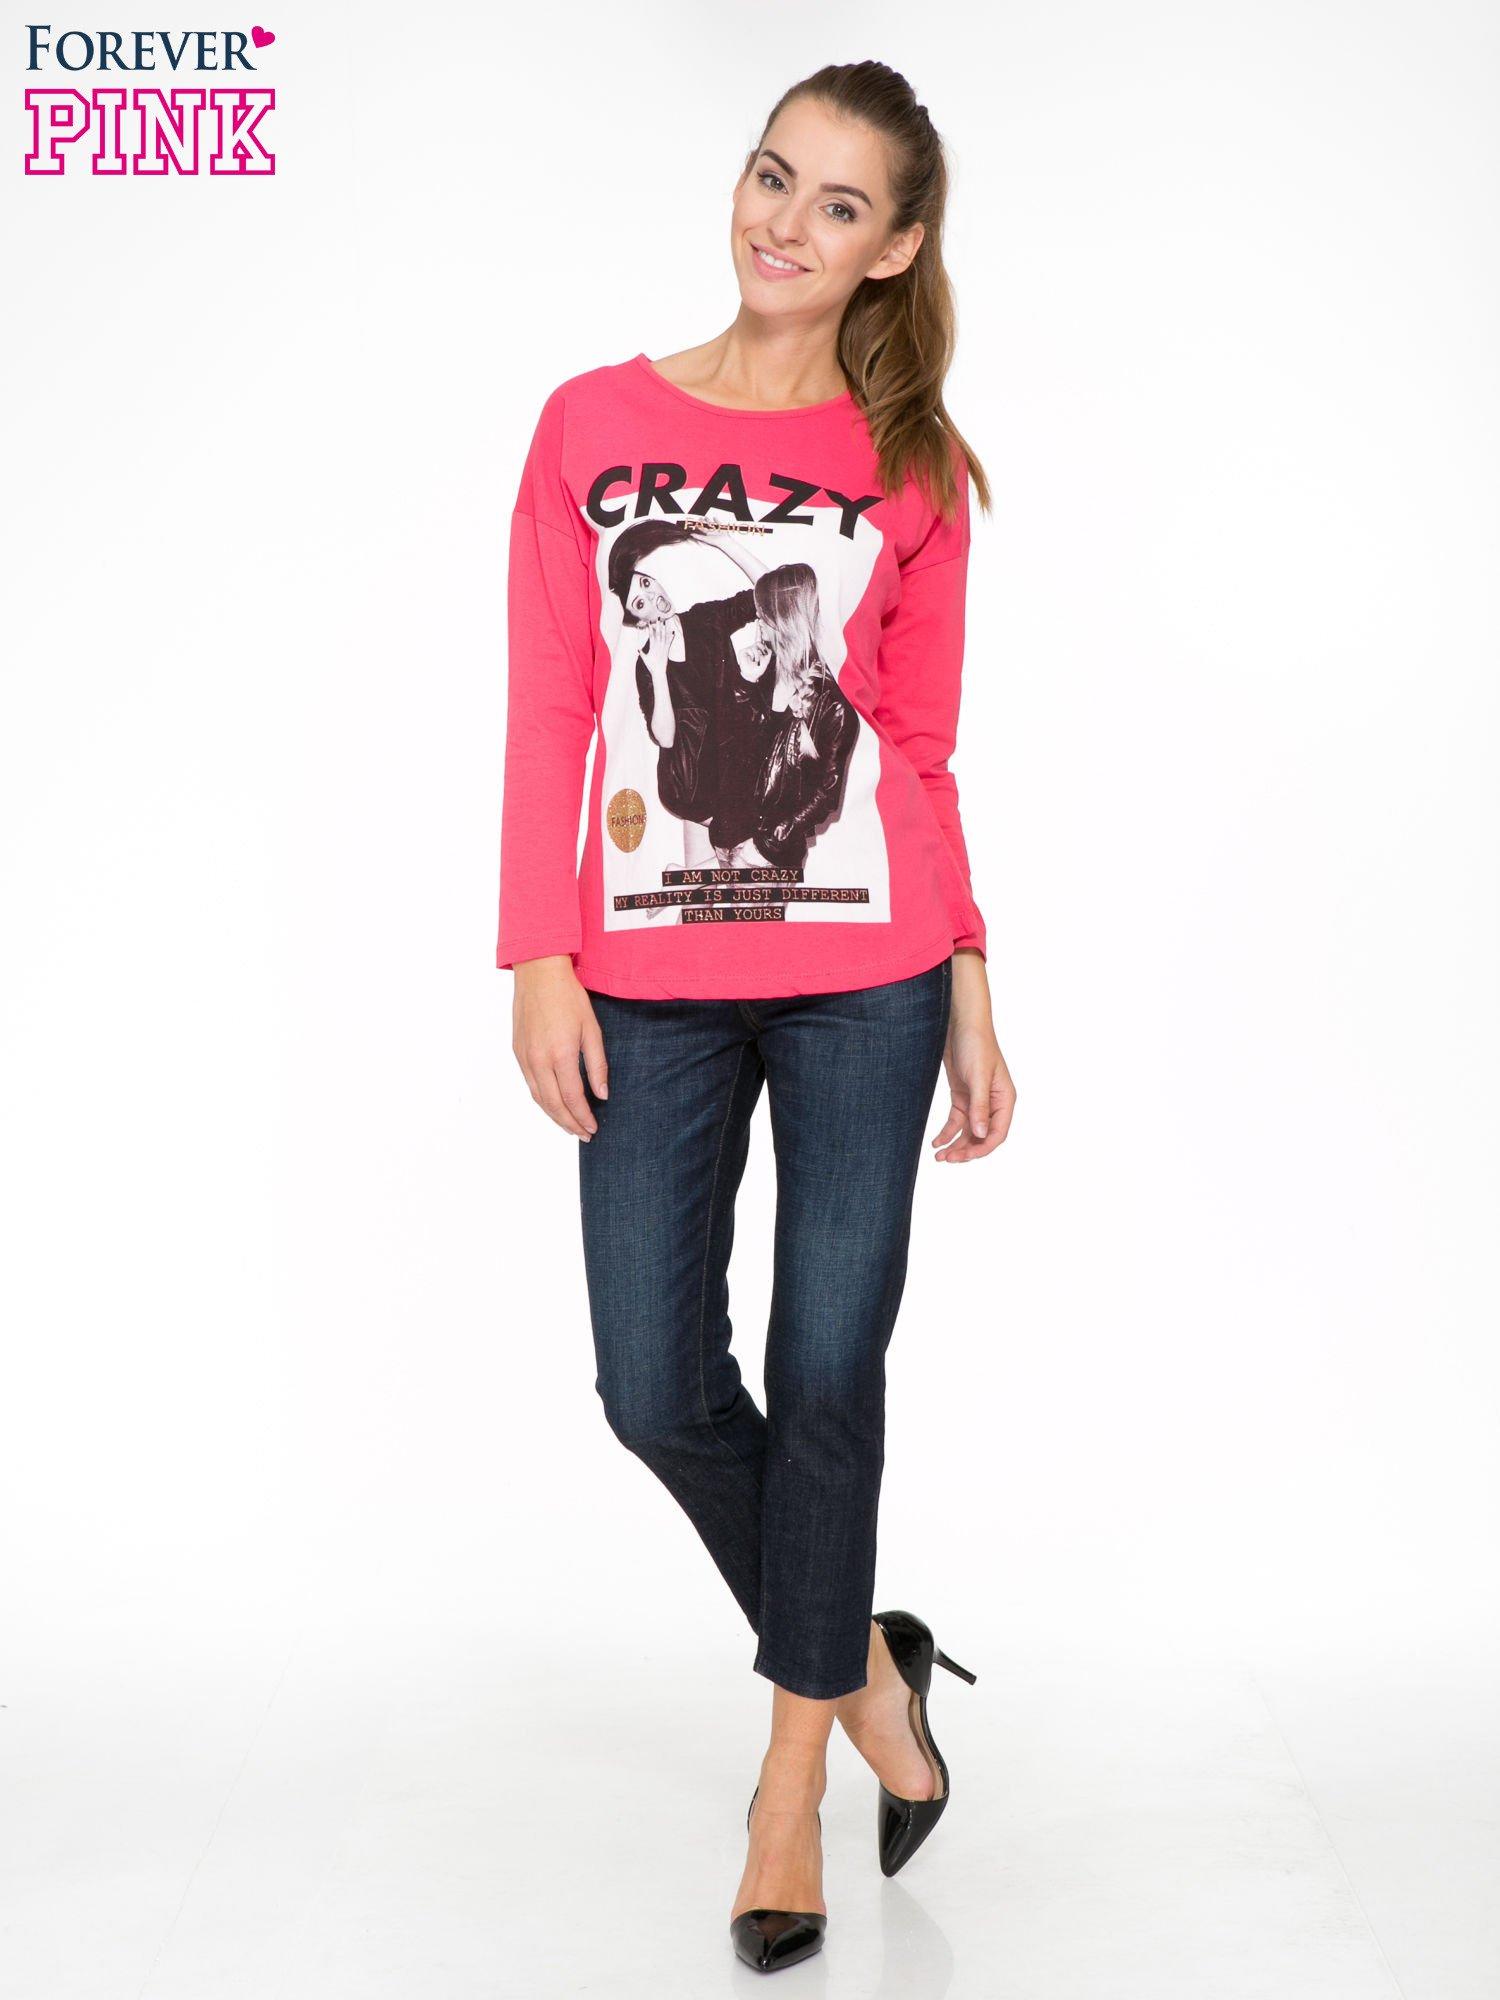 Koralowa bluzka z napisem CRAZY i nadrukiem fashionistek                                  zdj.                                  2